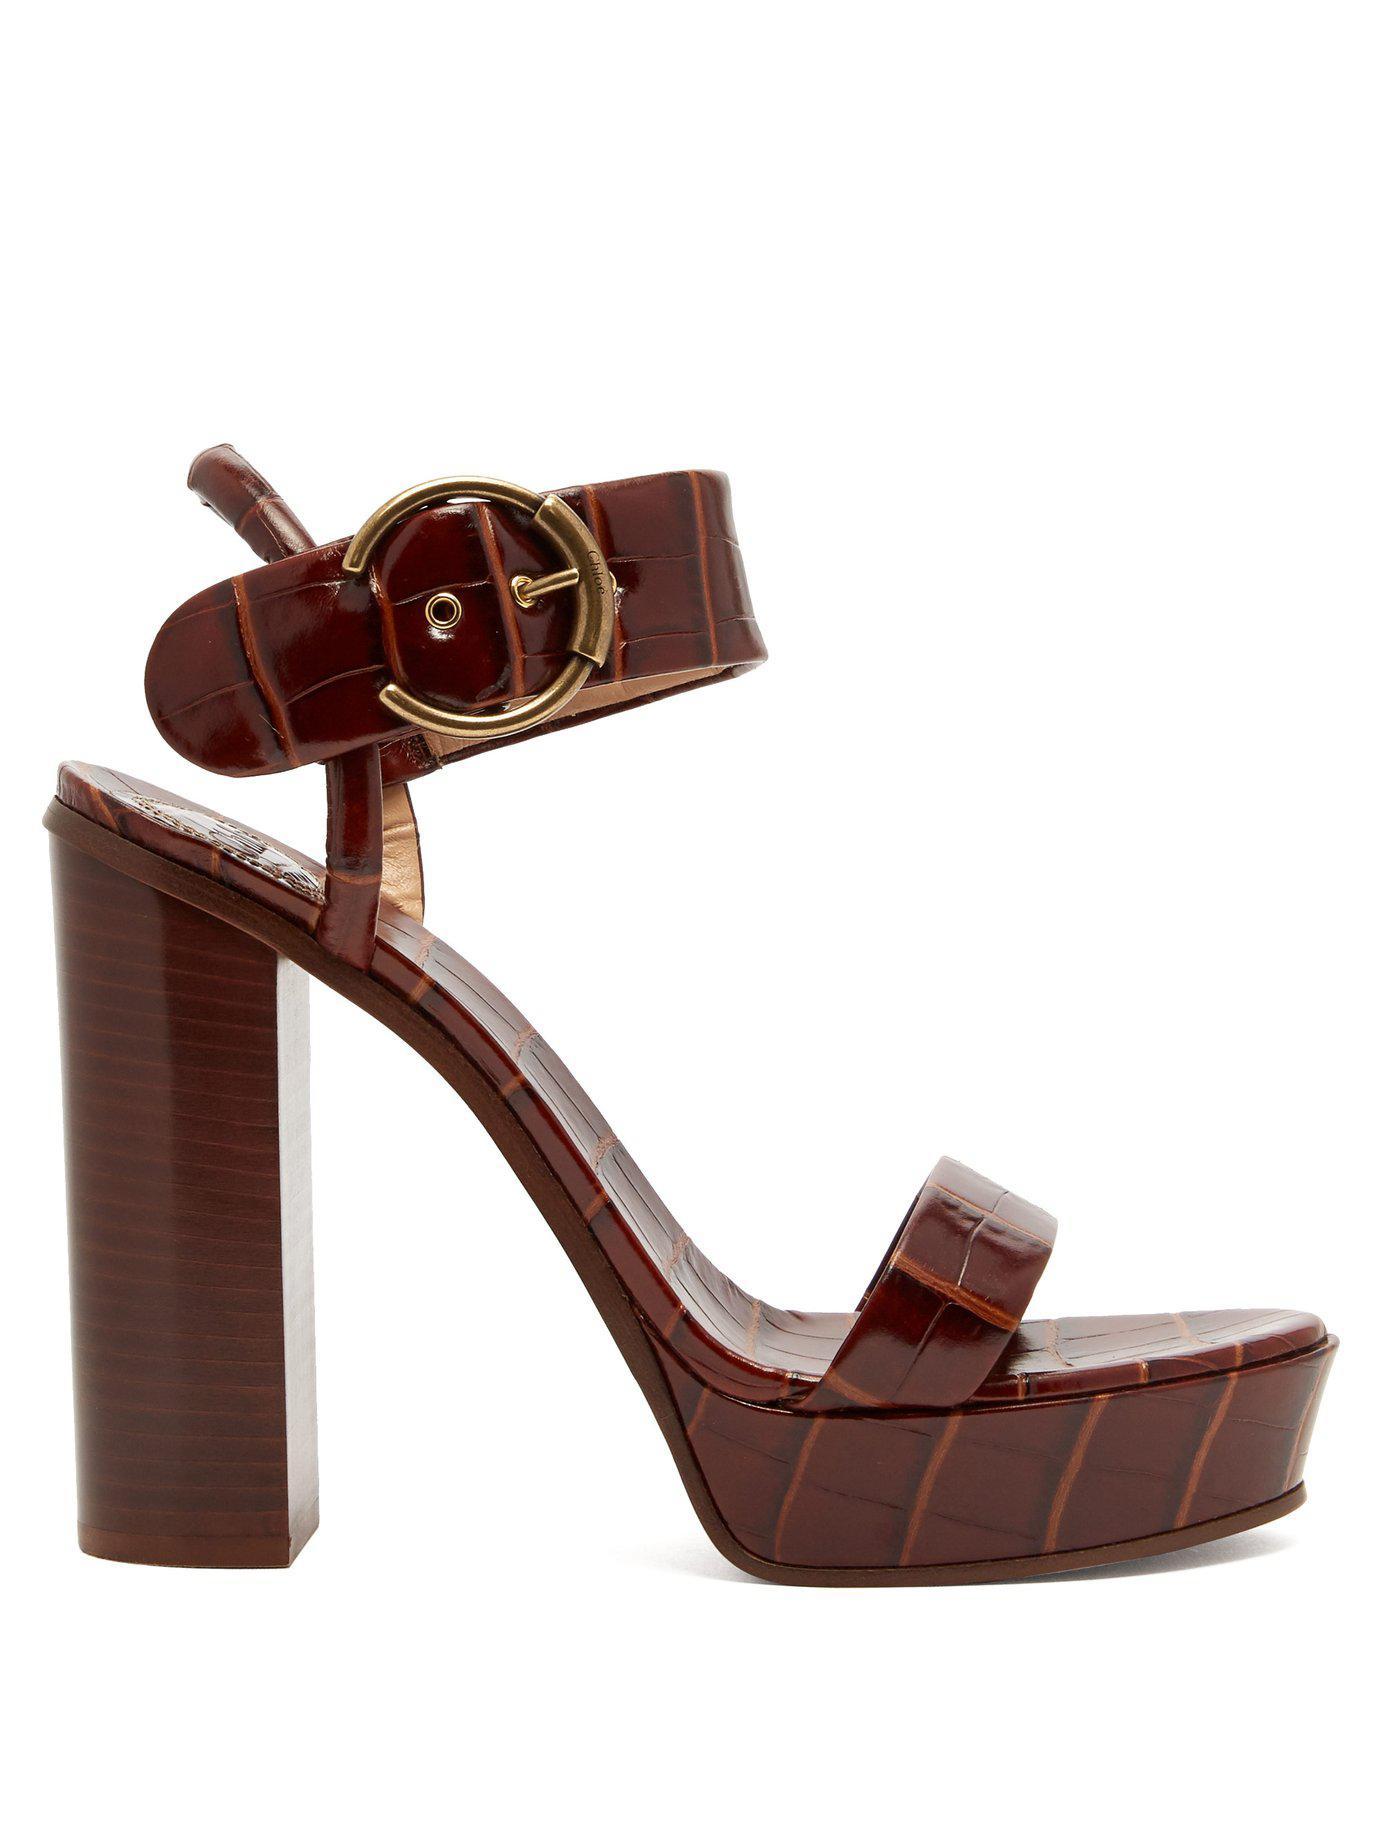 45a6f7a15 Lyst - Chloé Crocodile Effect Leather Platform Sandals in Brown